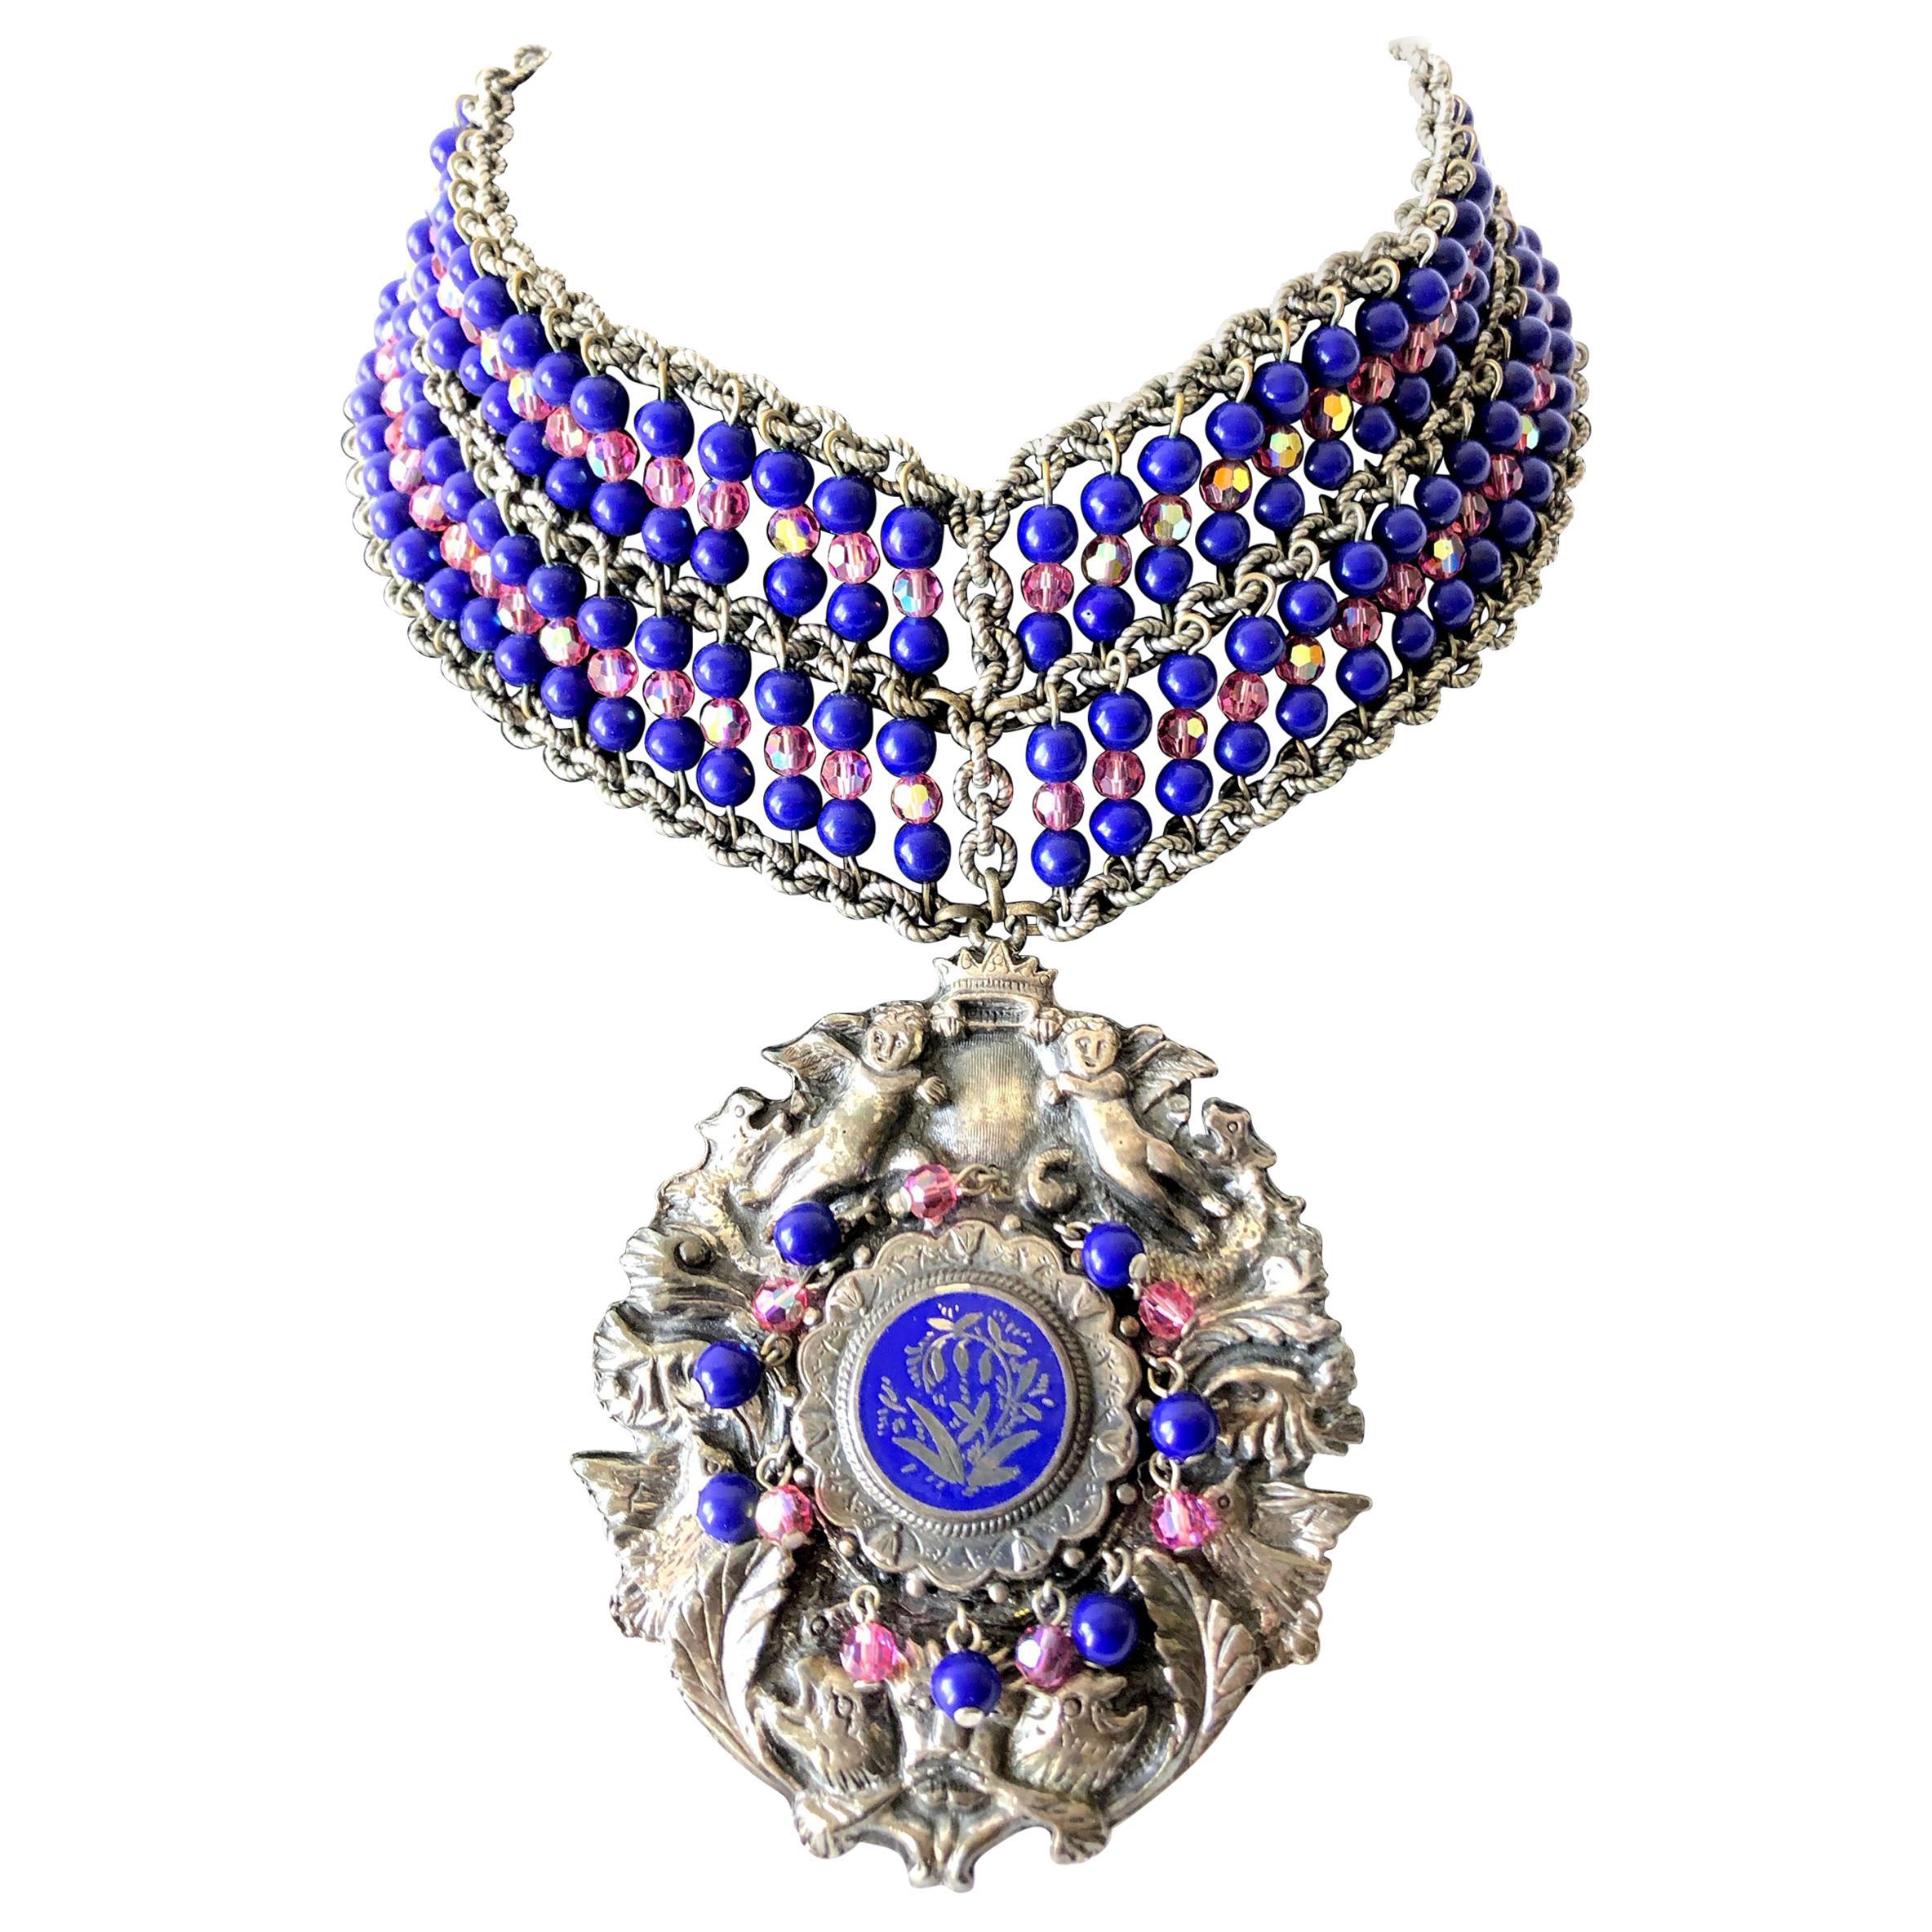 1980s Mark Merrill Vintage Glass Bead Medallion Necklace